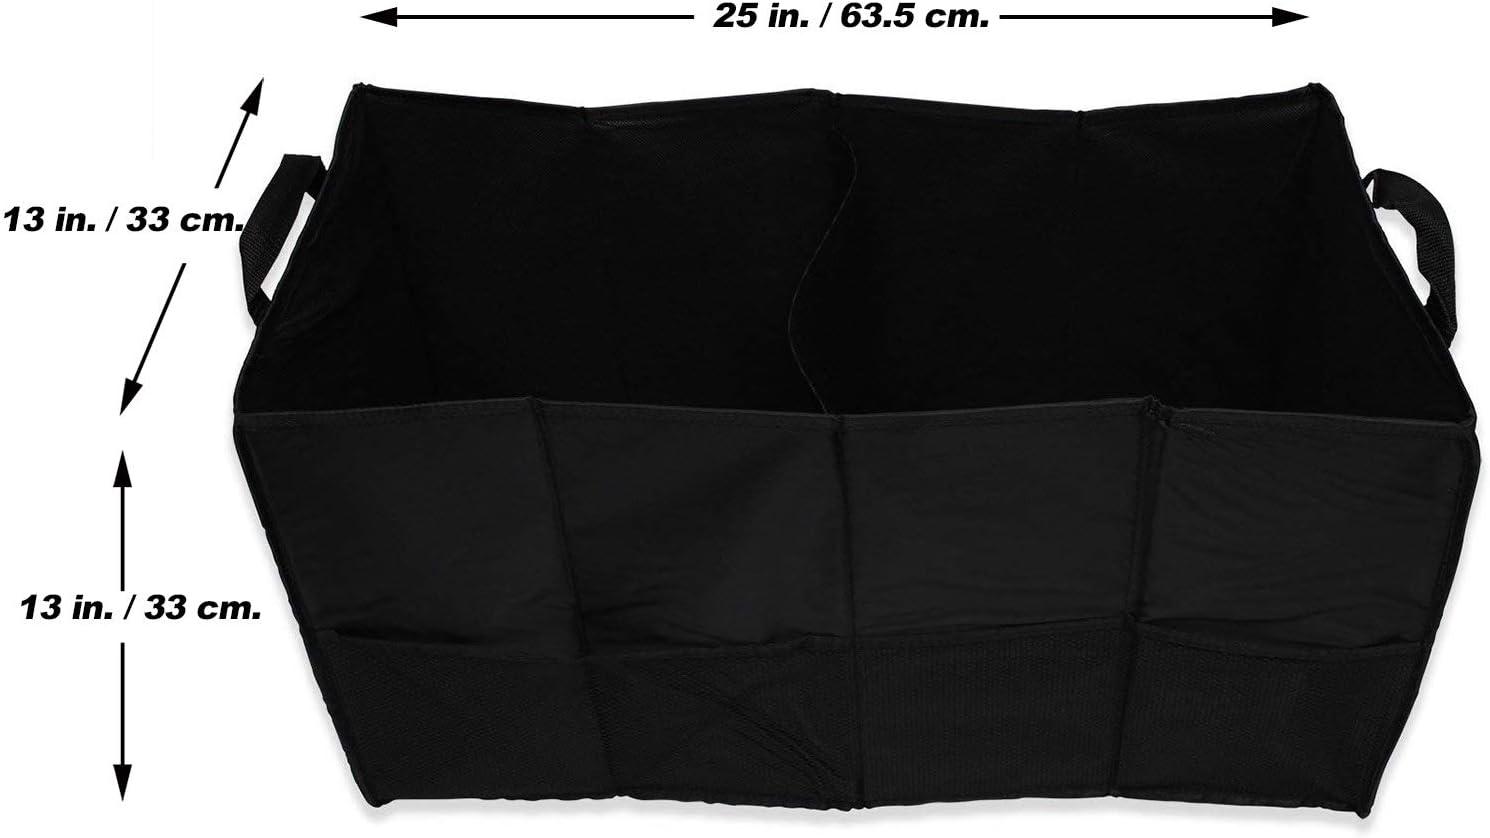 EASYVIEW Expandable Car SUV Trunkster Storage Organizer Black//White Plaid